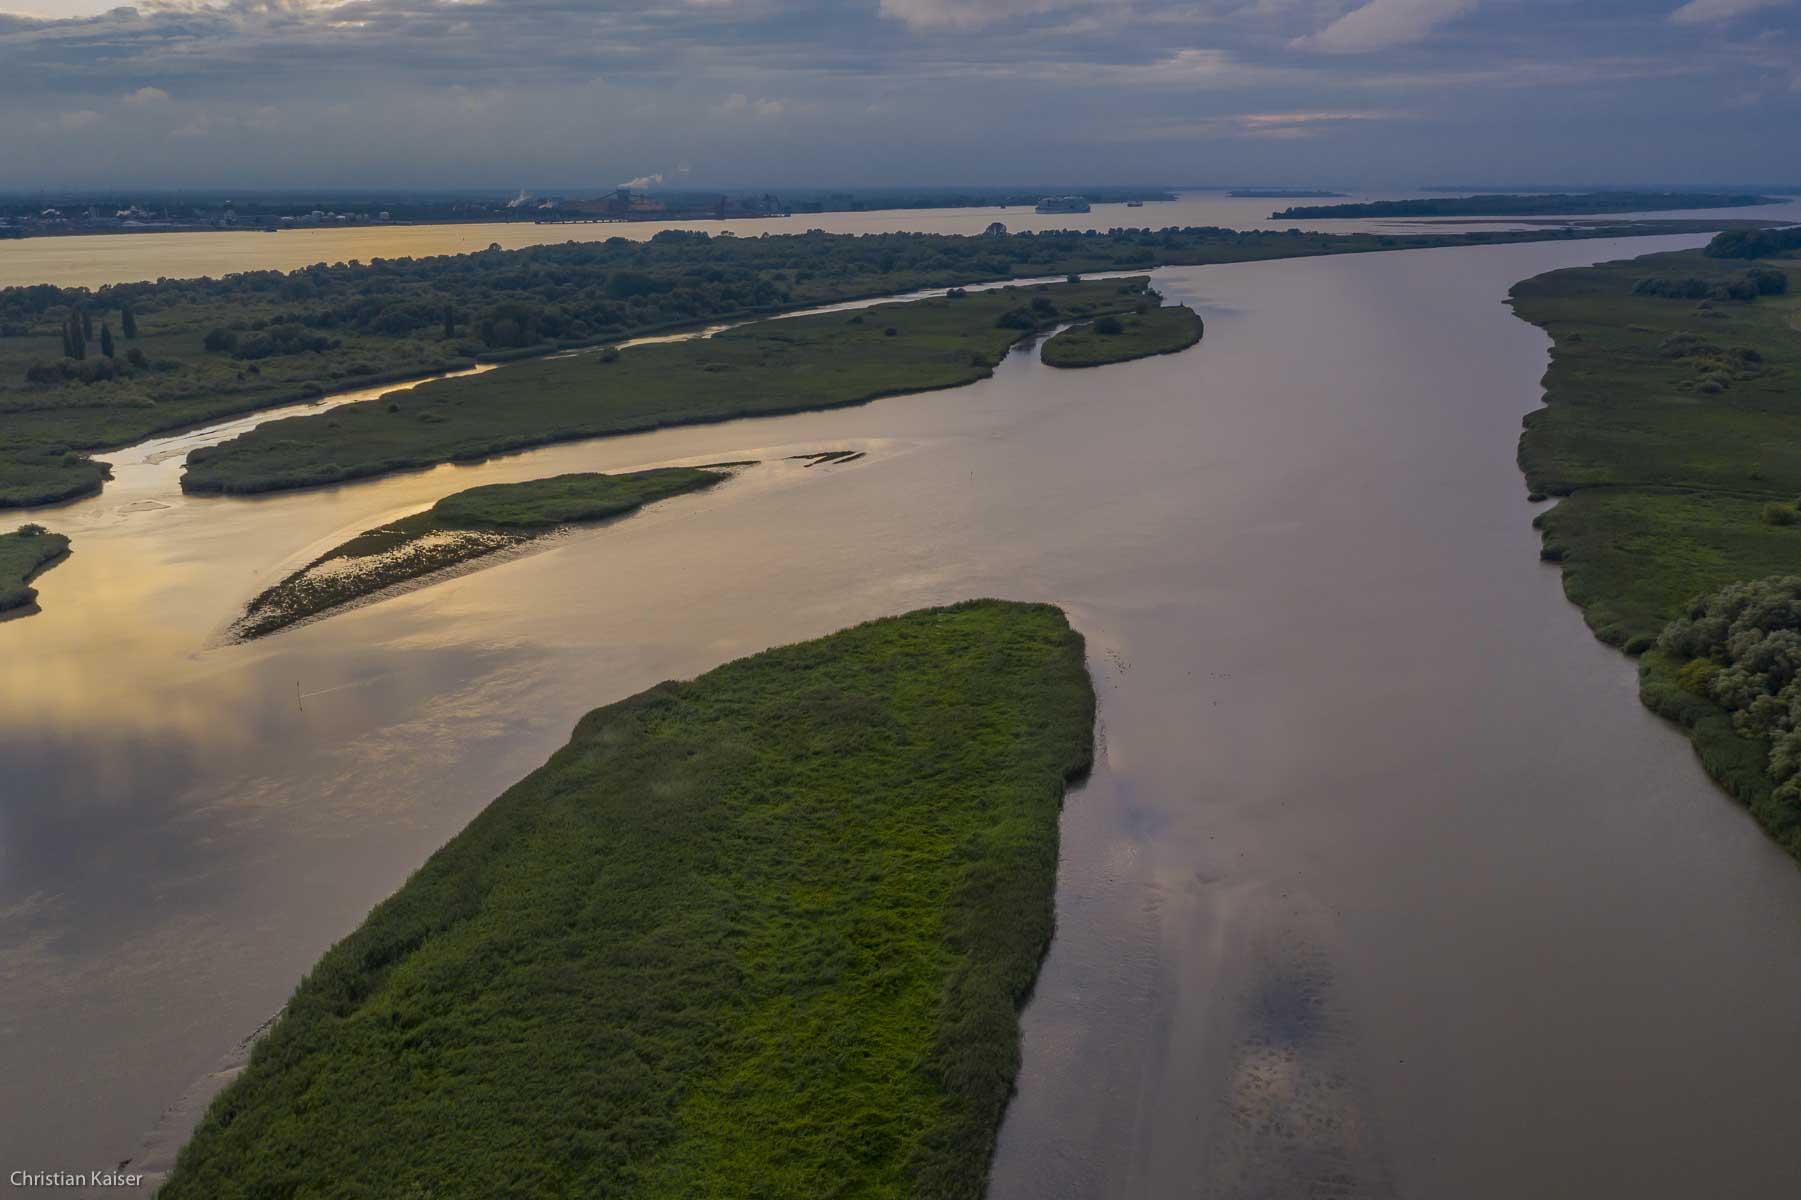 The Island Auberg-Drommel in the river Elbe